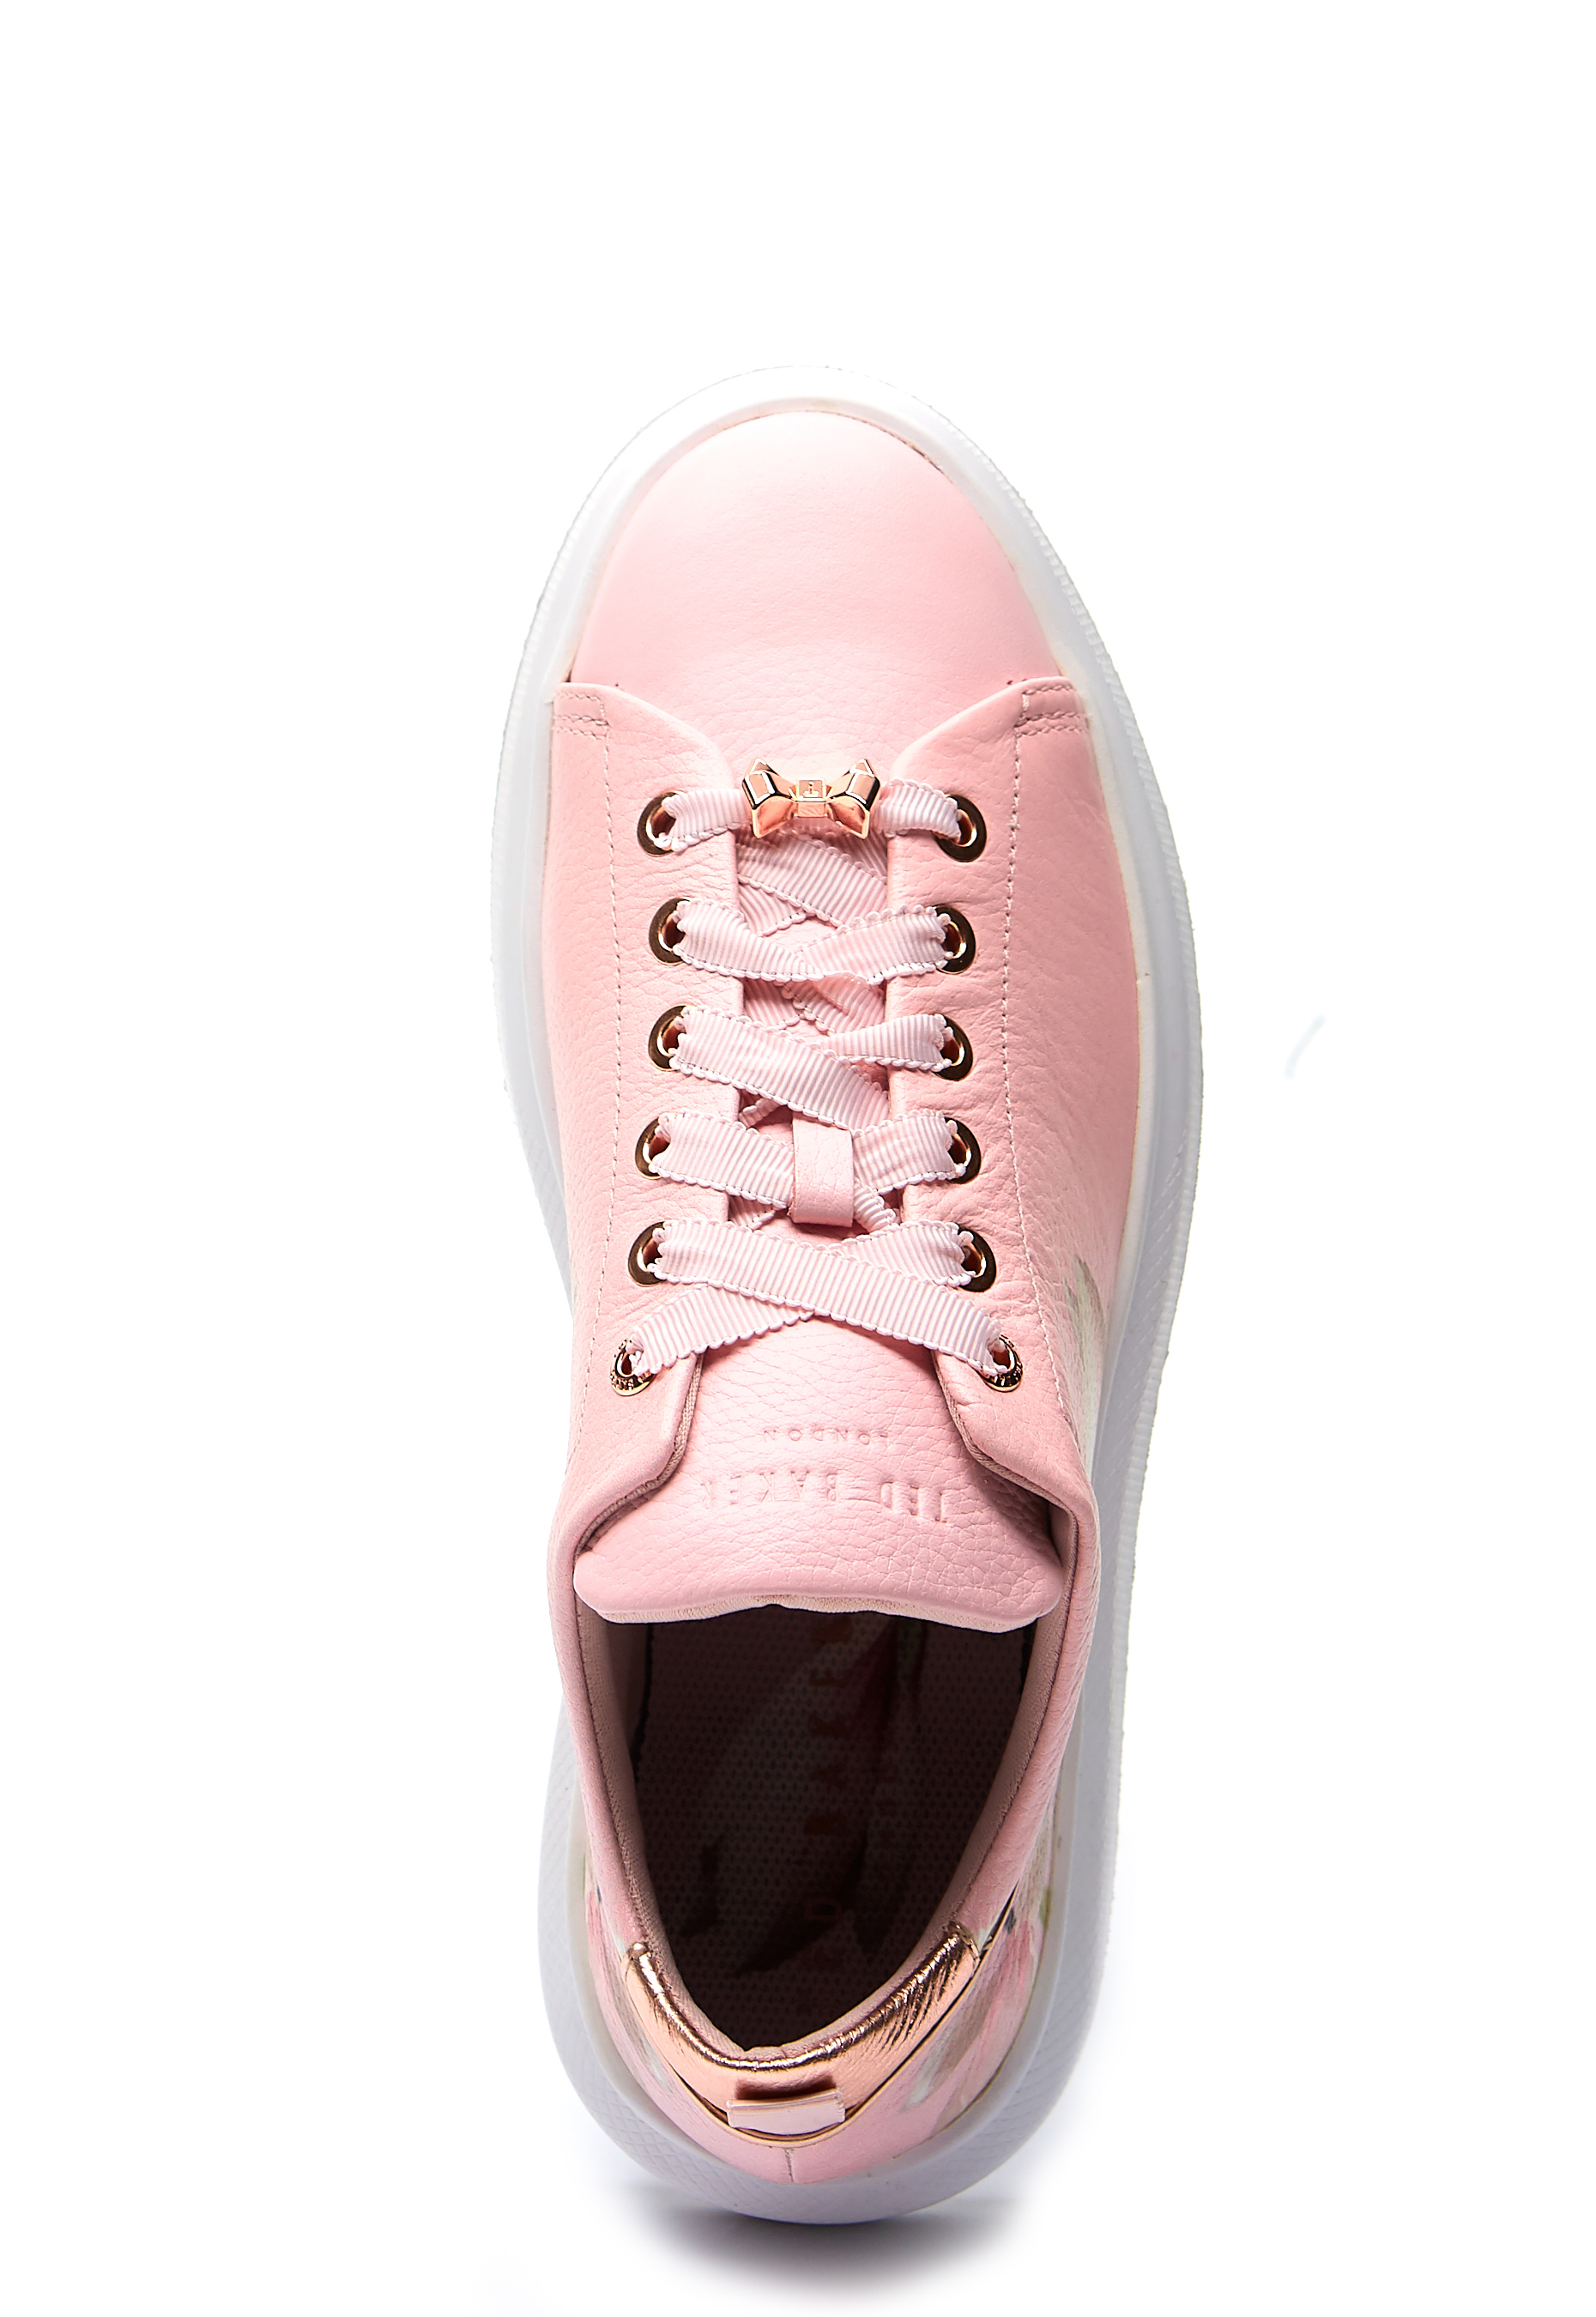 2f53fec58470ec Ted Baker Ailbe Shoes Blossom Harmony - Bubbleroom